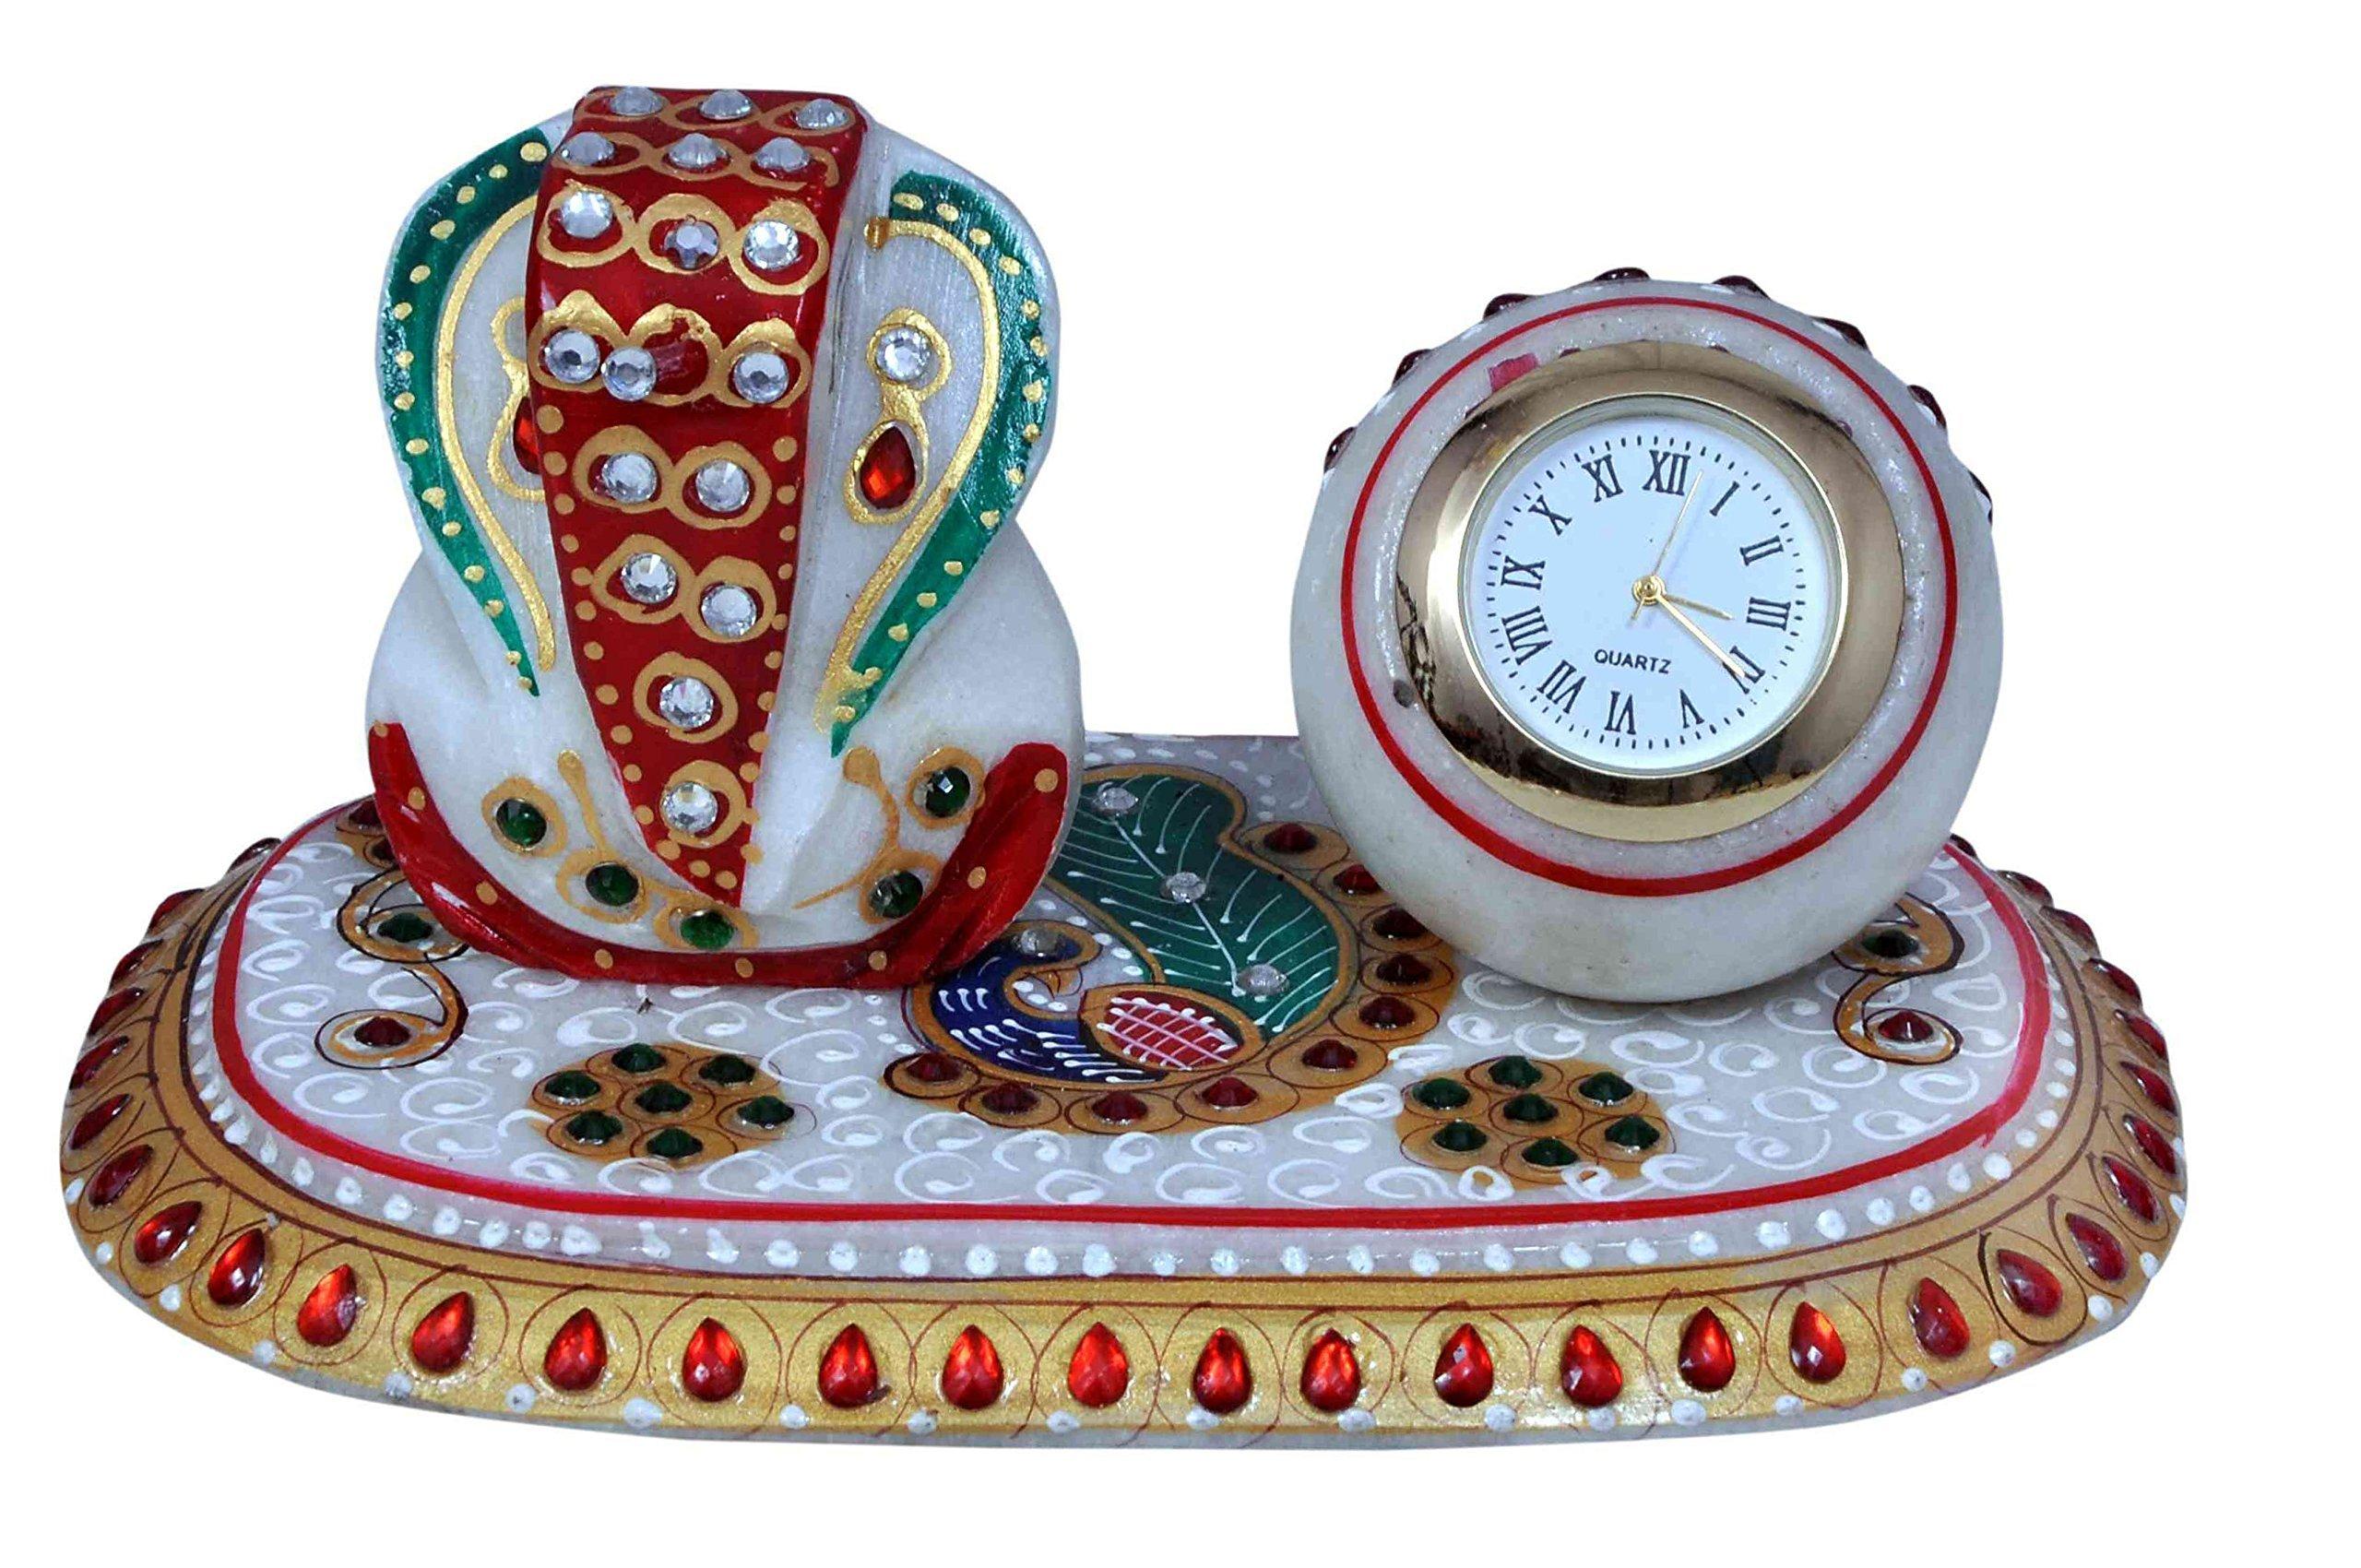 Craft Trade Antique Designer Analog Watch And Lord Ganesh Idol With Pawati 8.5x10 Multi Purpose Designer Analog Watch by Craft Trade